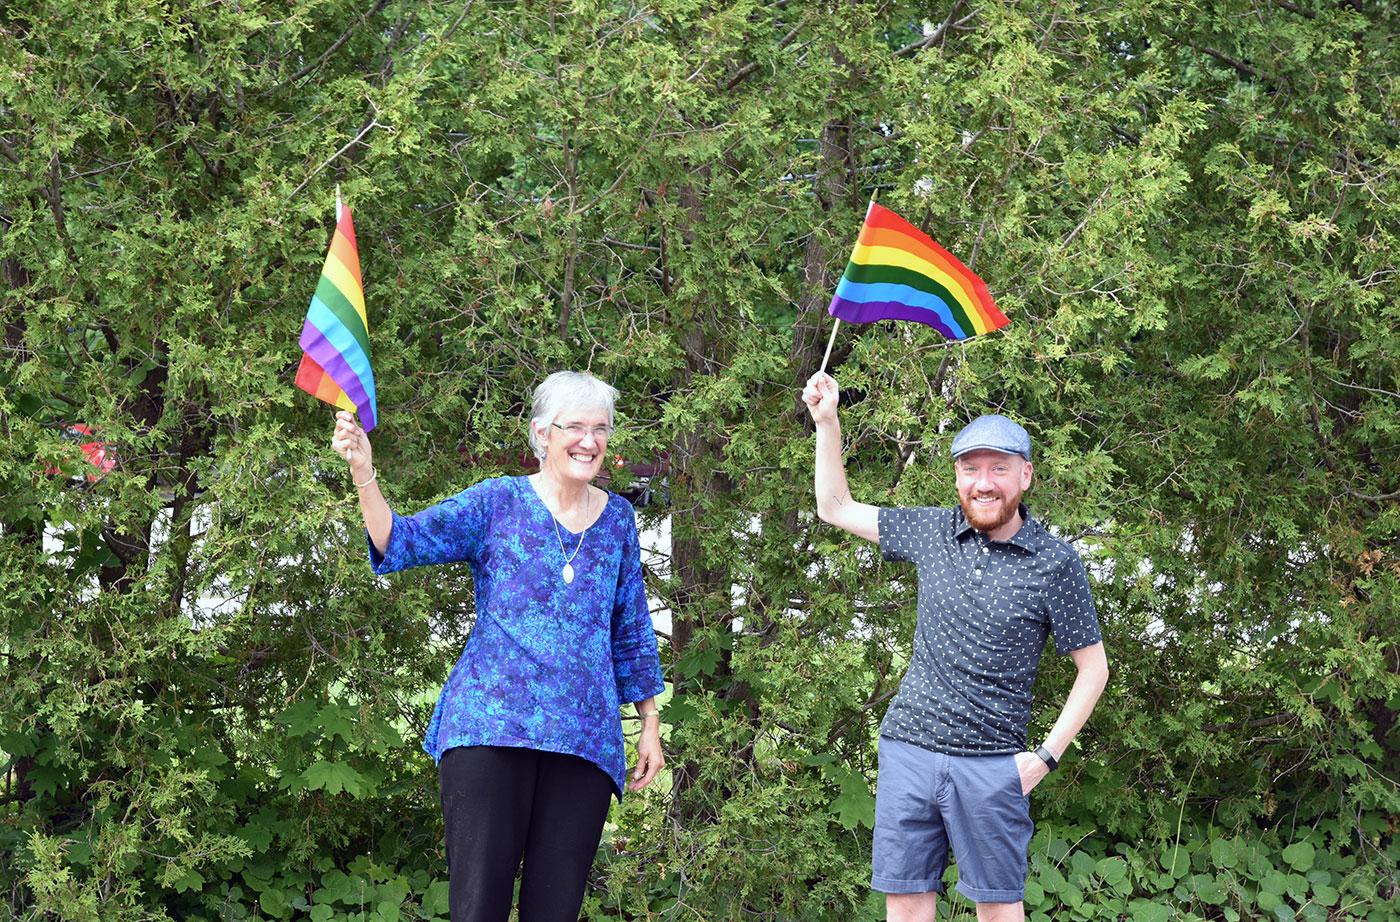 Lisa and Levi waving pride flags